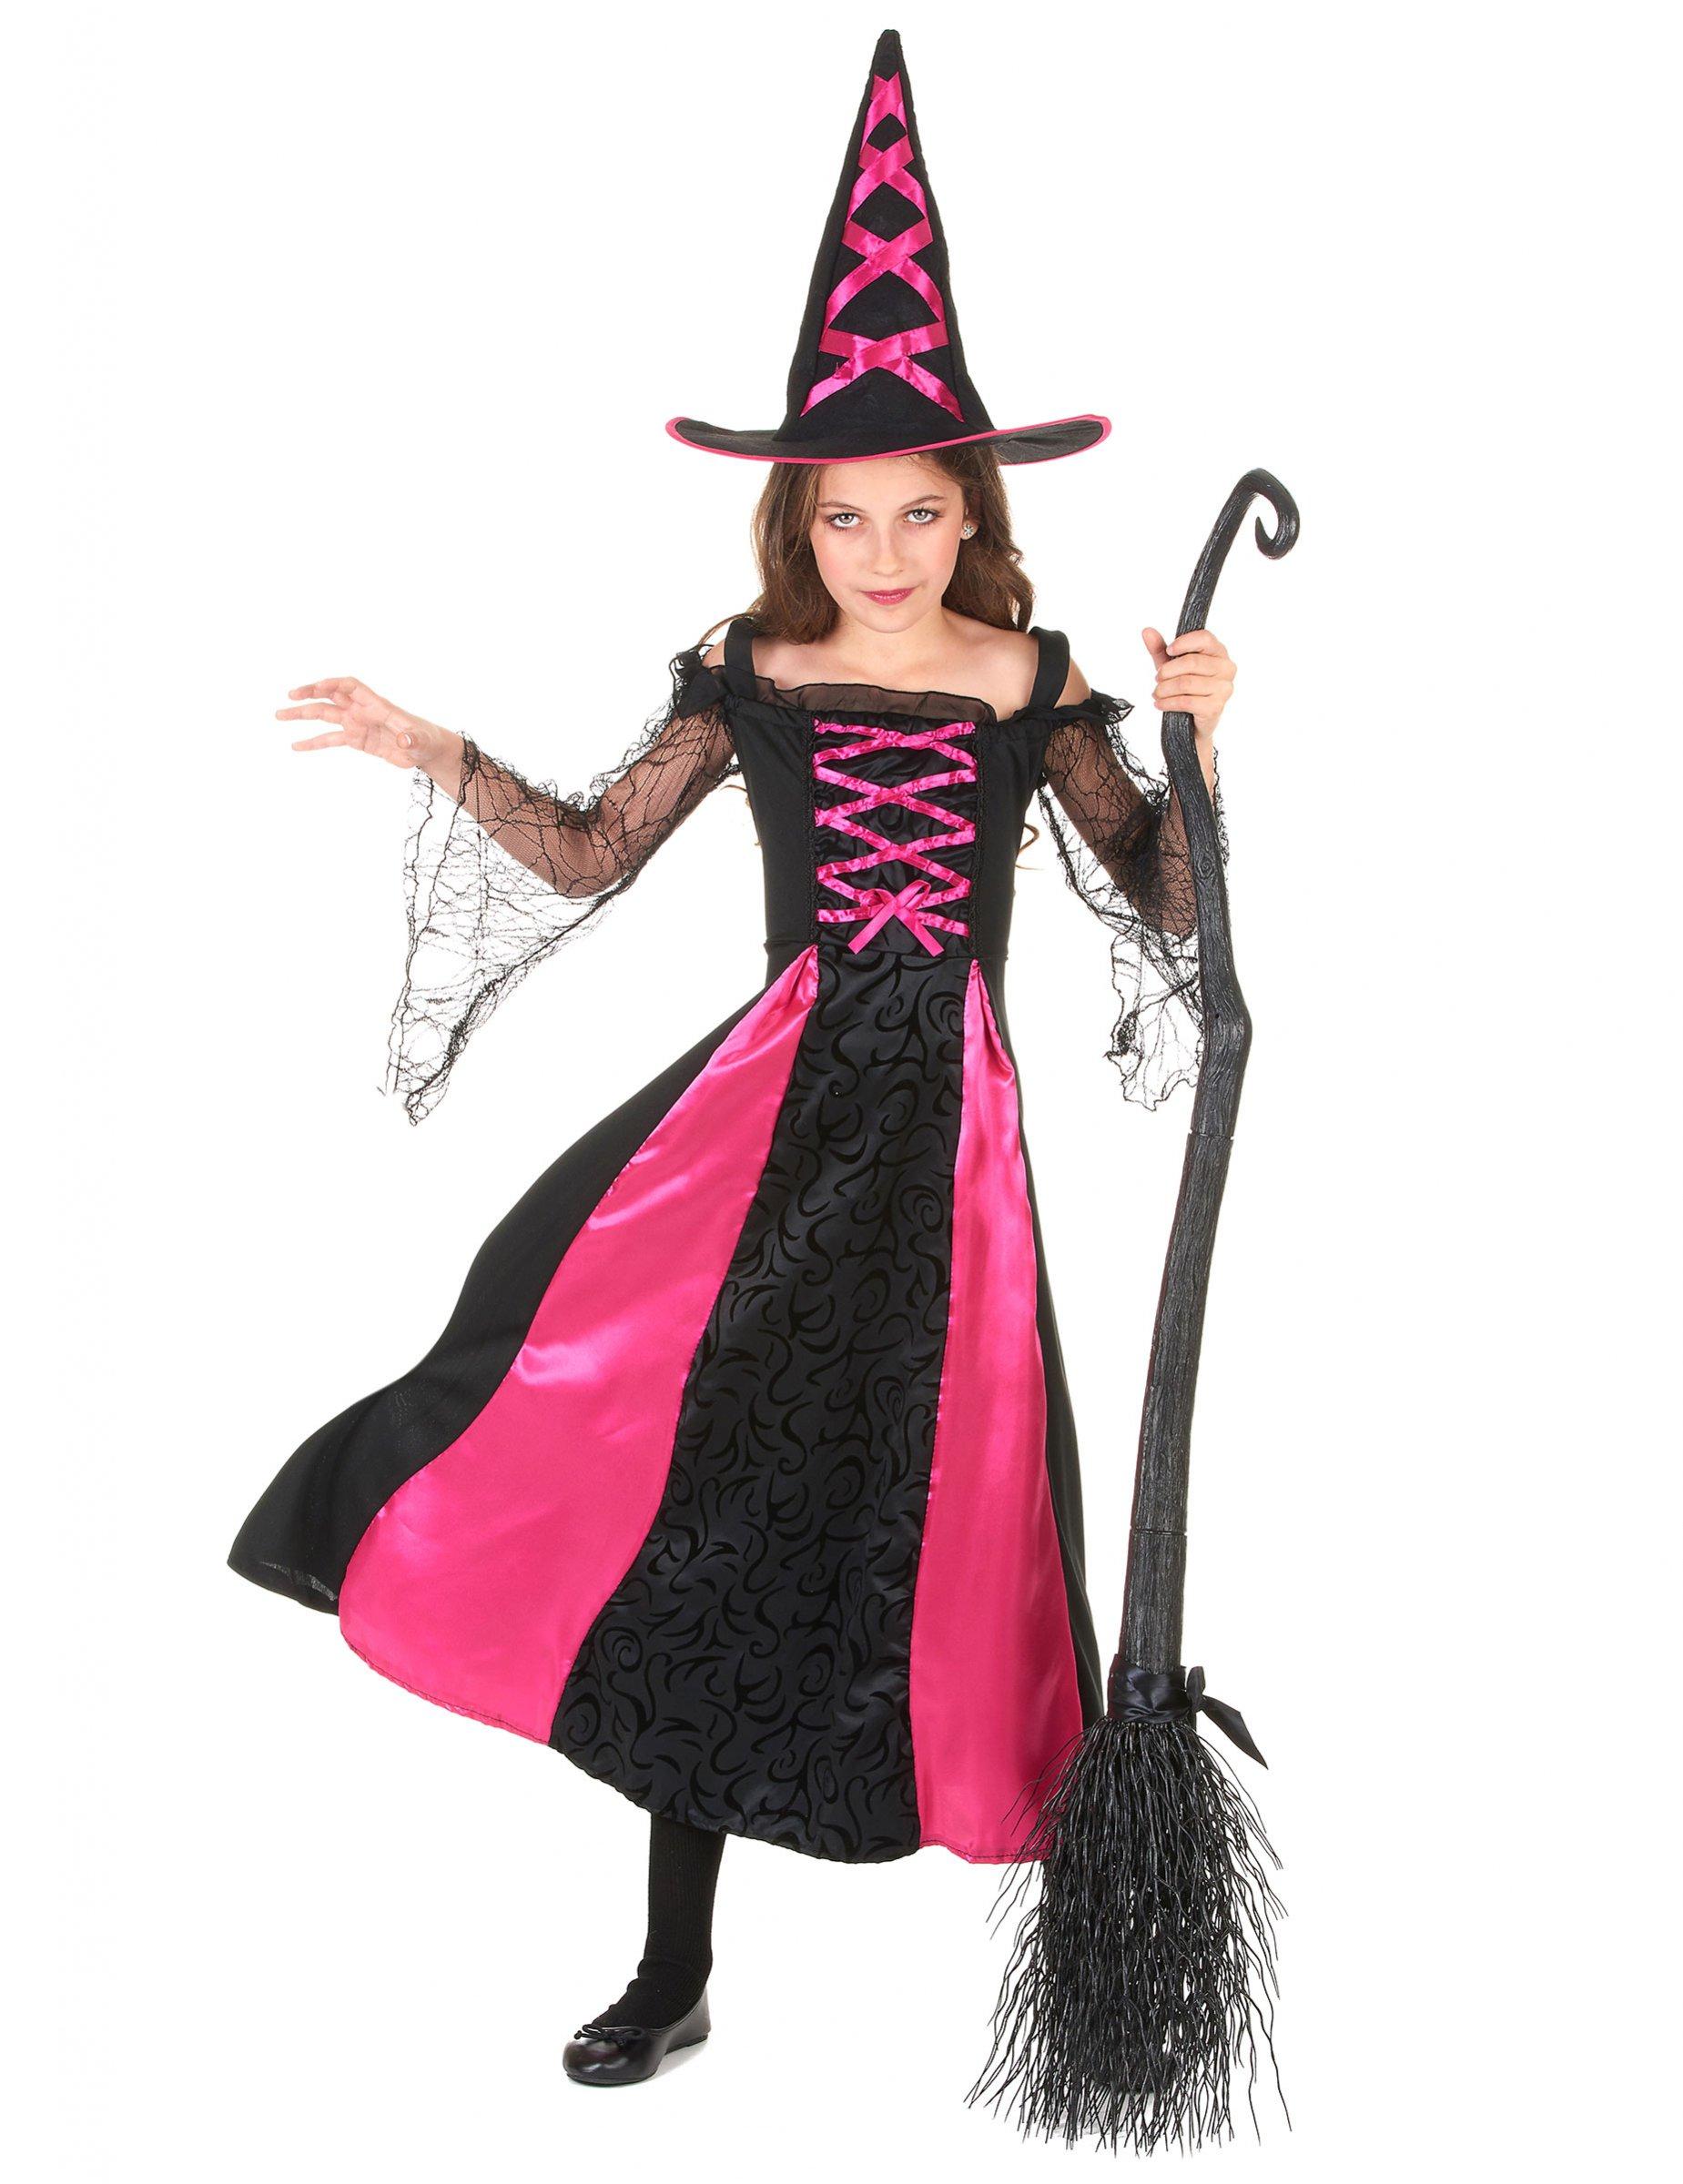 Vestiti Halloween Strega.Costume Da Strega Fucsia Bambina Halloween